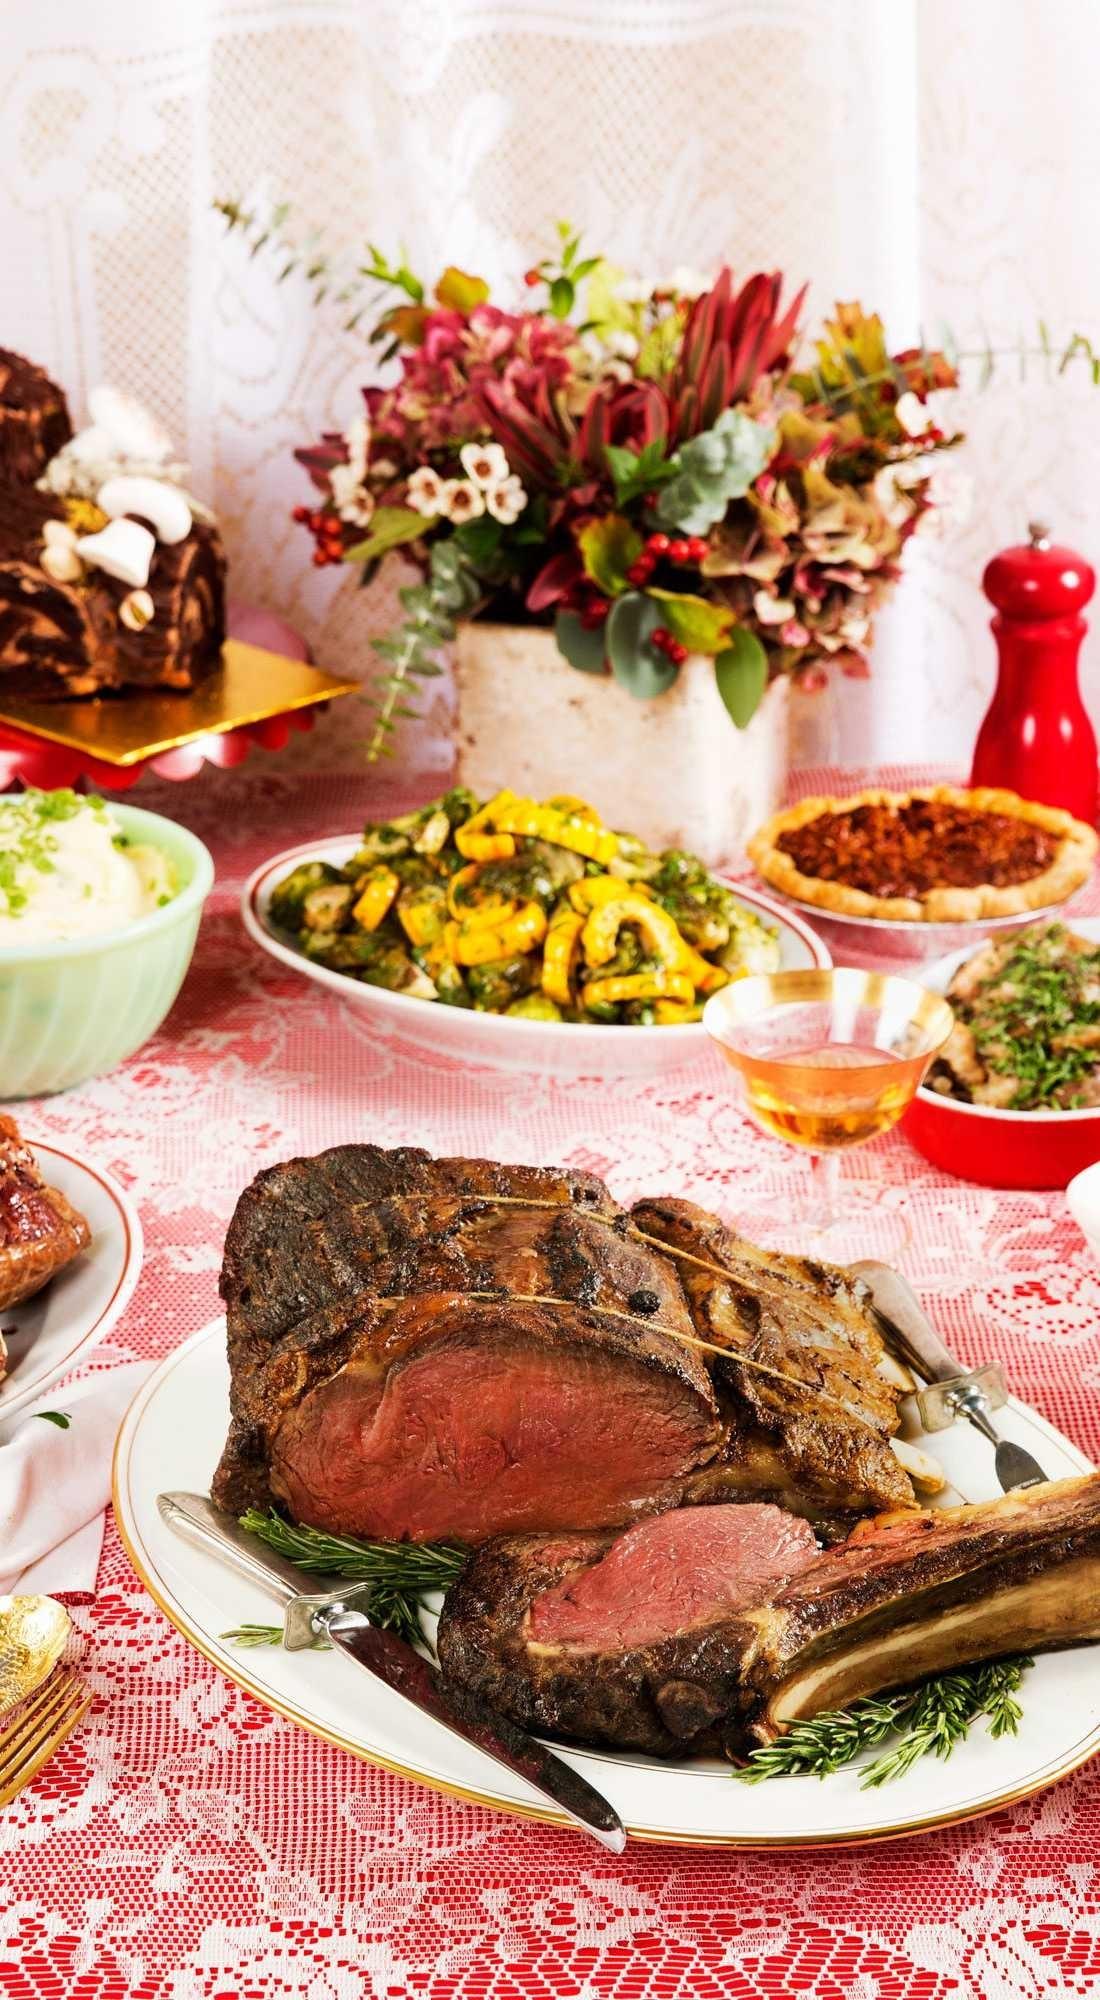 Prime Rib Christmas Dinner Menu Ideas  10 Unique Prime Rib Dinner Menu Ideas 2019